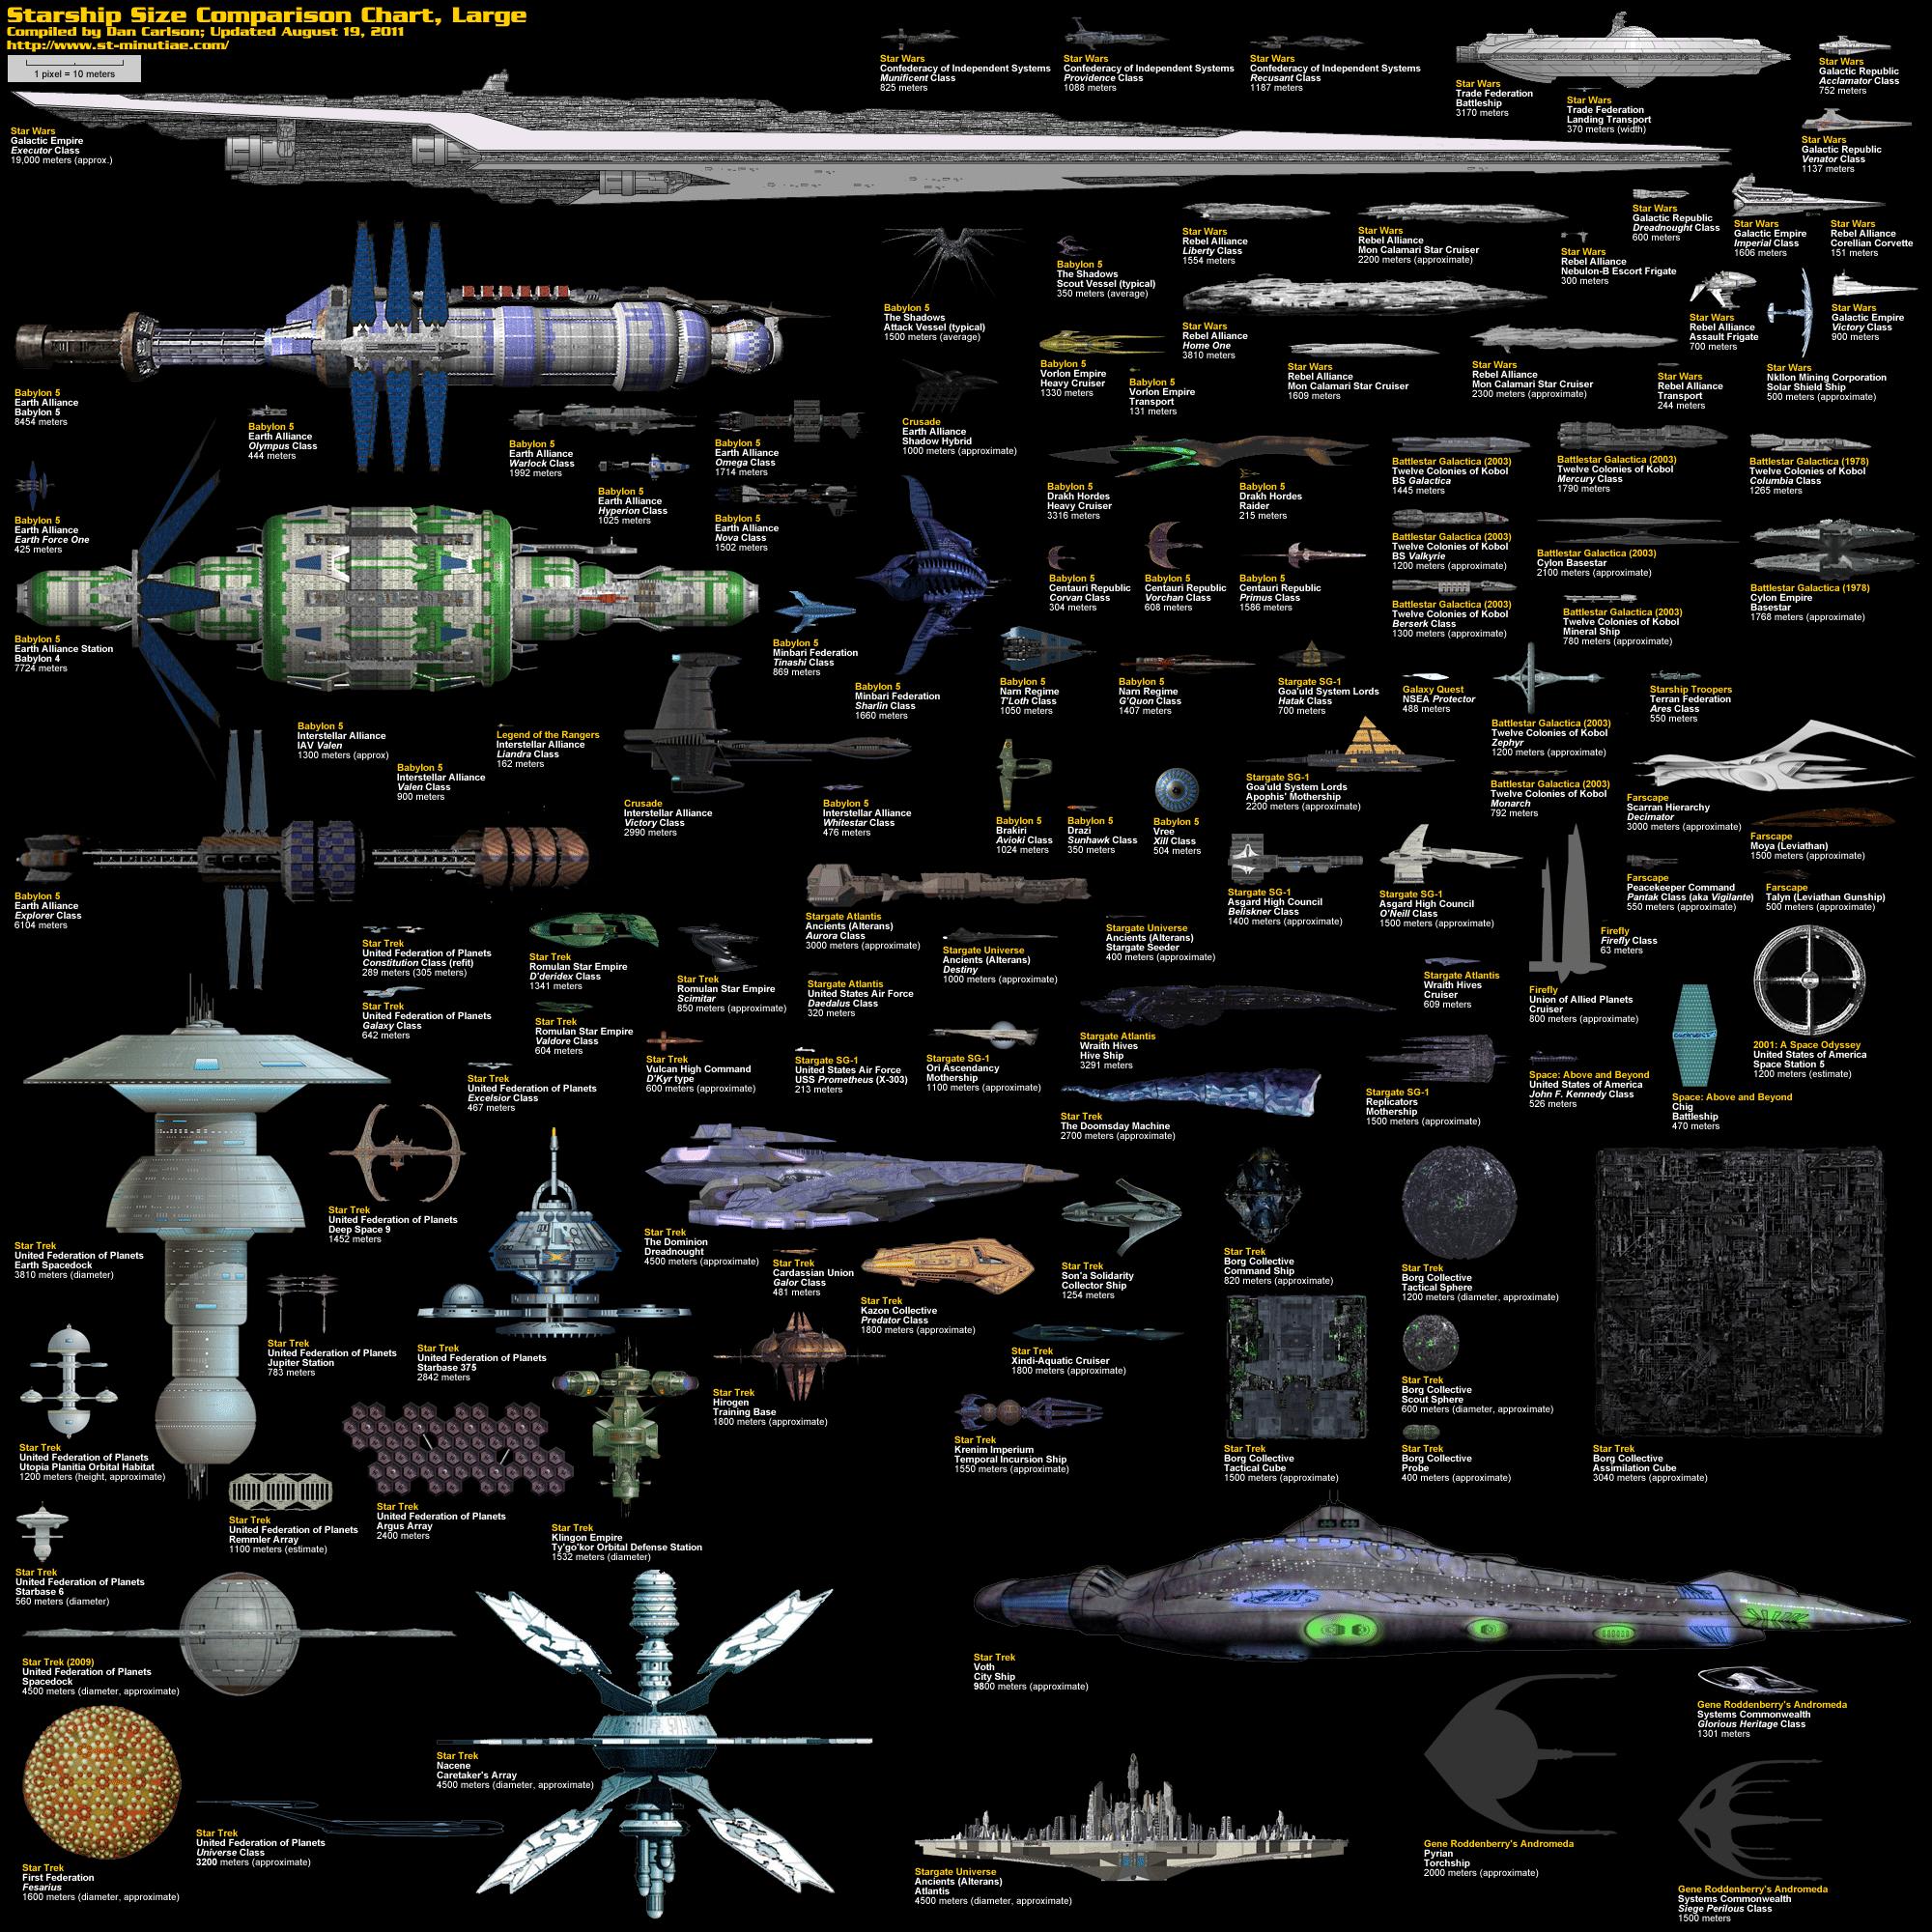 Science Fiction Spaceship Comparison Infographic